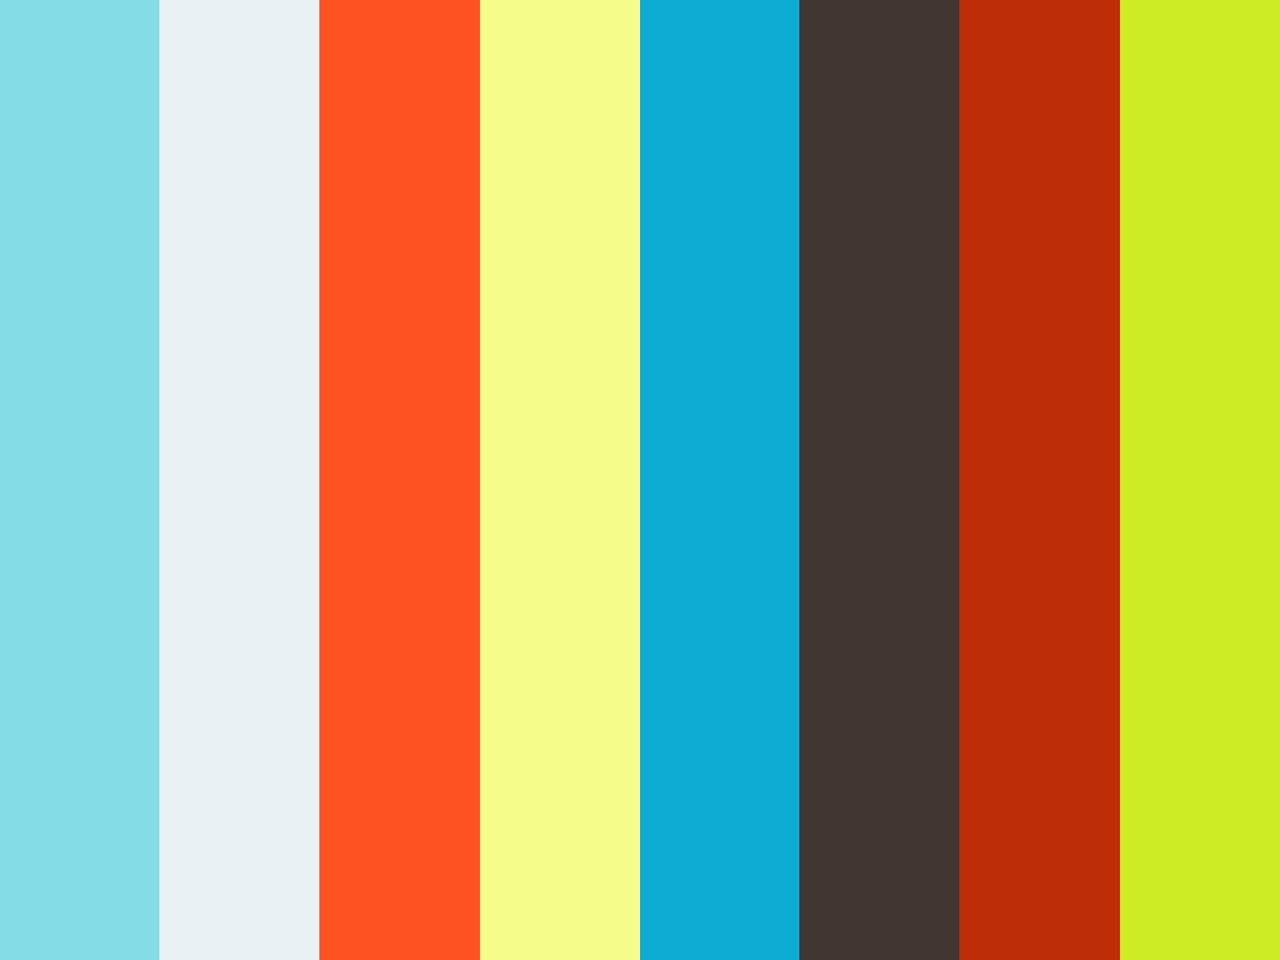 deadmau5 - Pacha Radio Show #10 (Rádio Atlântida) 27.12.2014